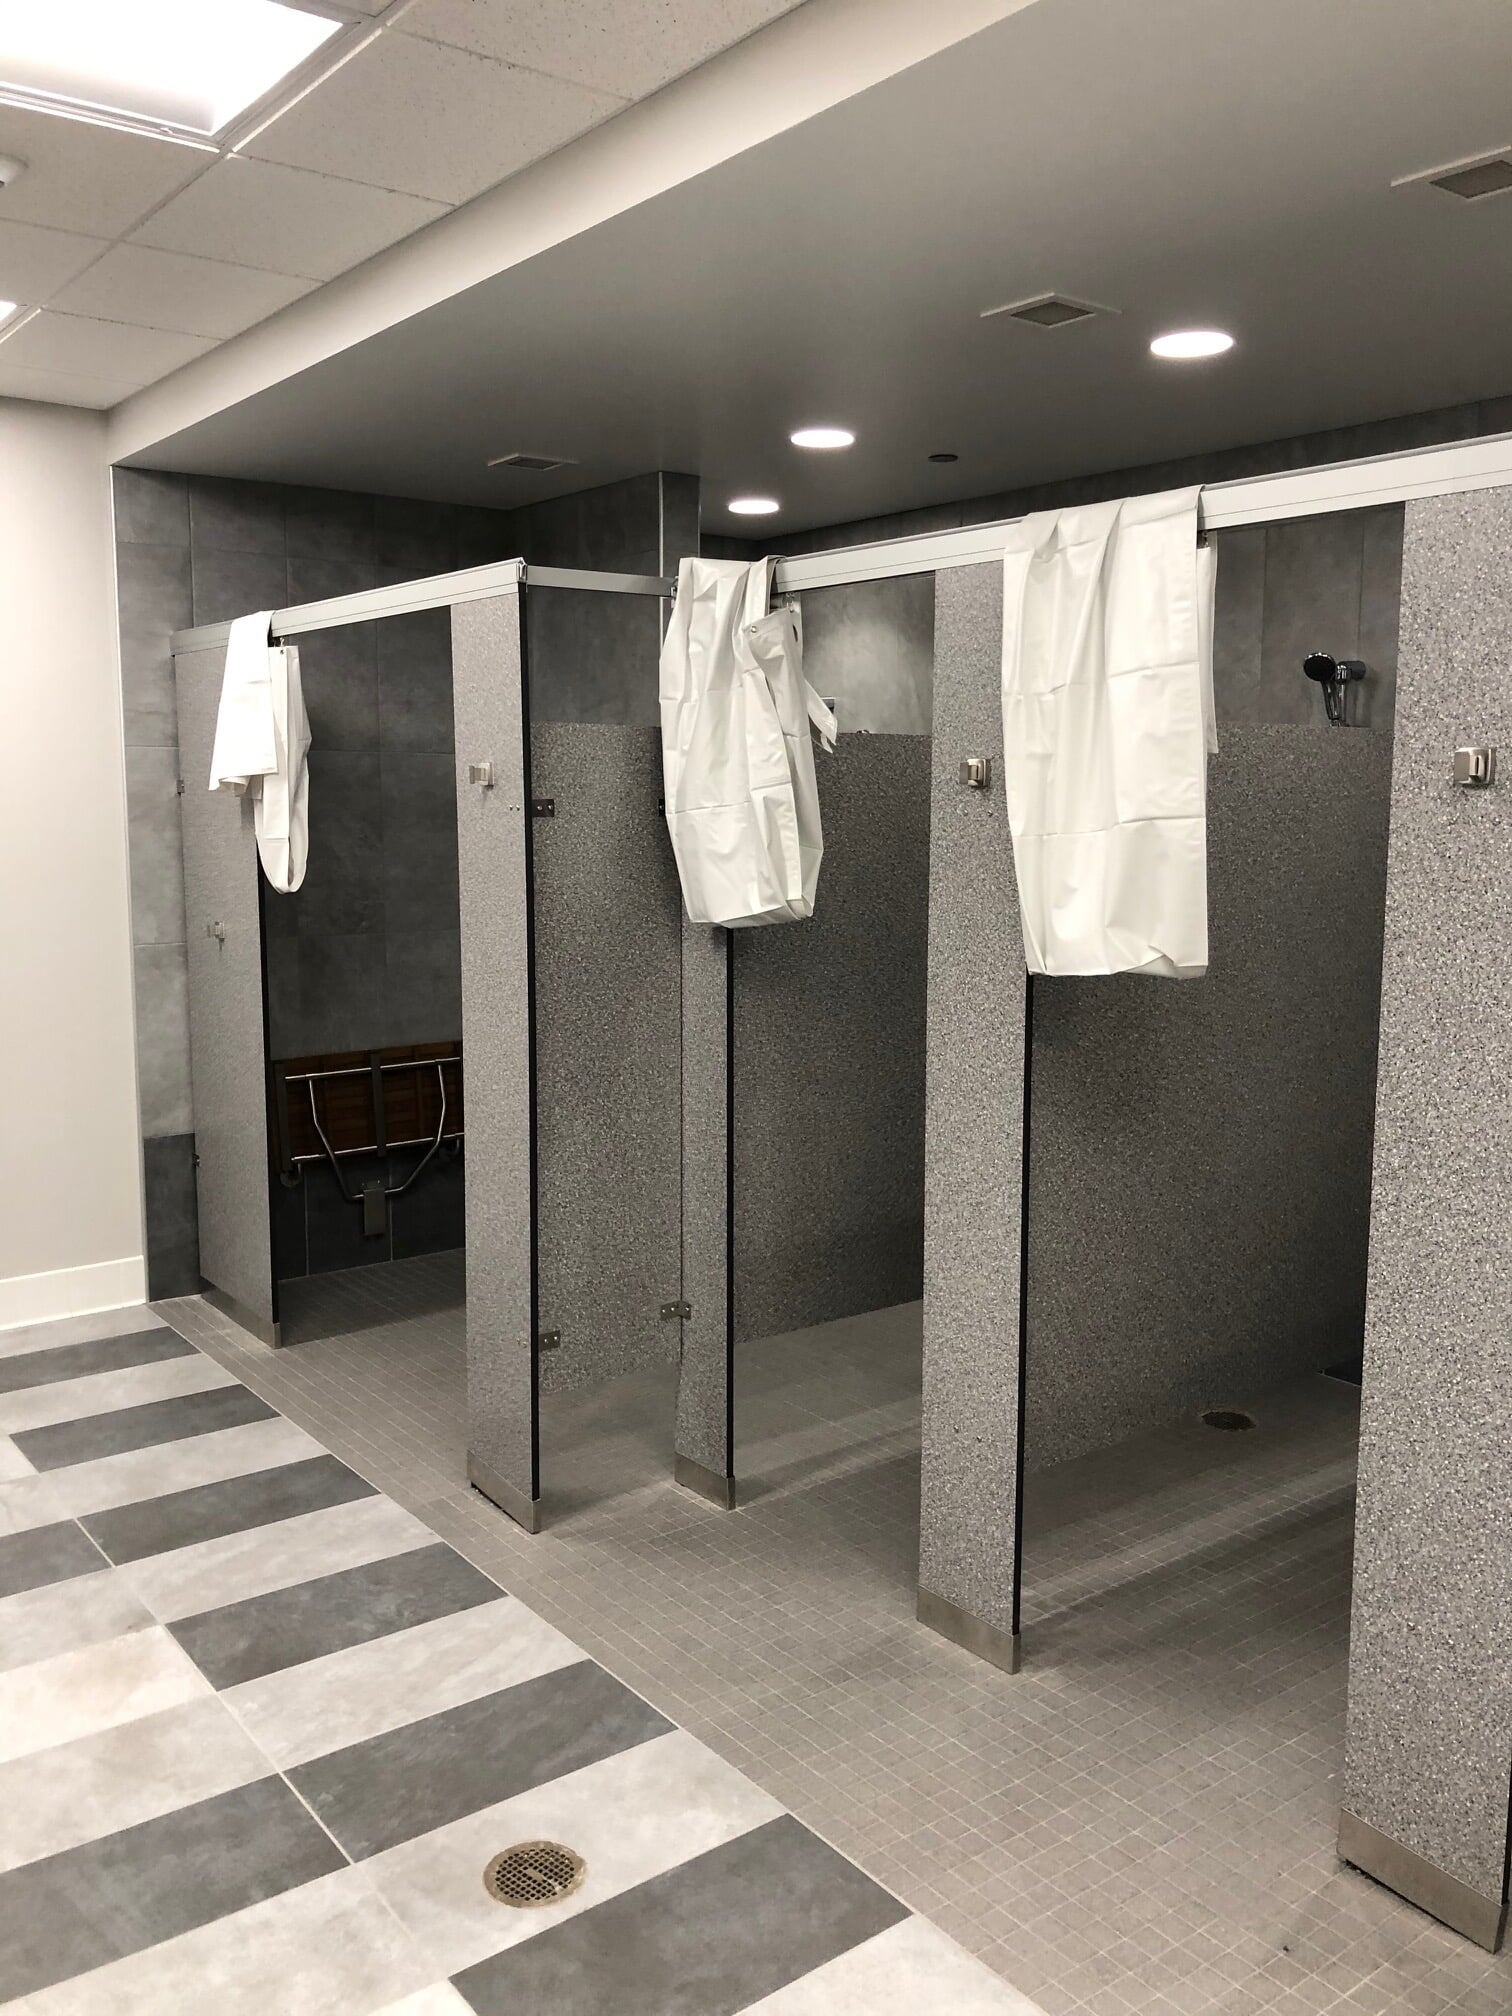 Commercial shower installation in  from Barrington Carpet & Flooring Design